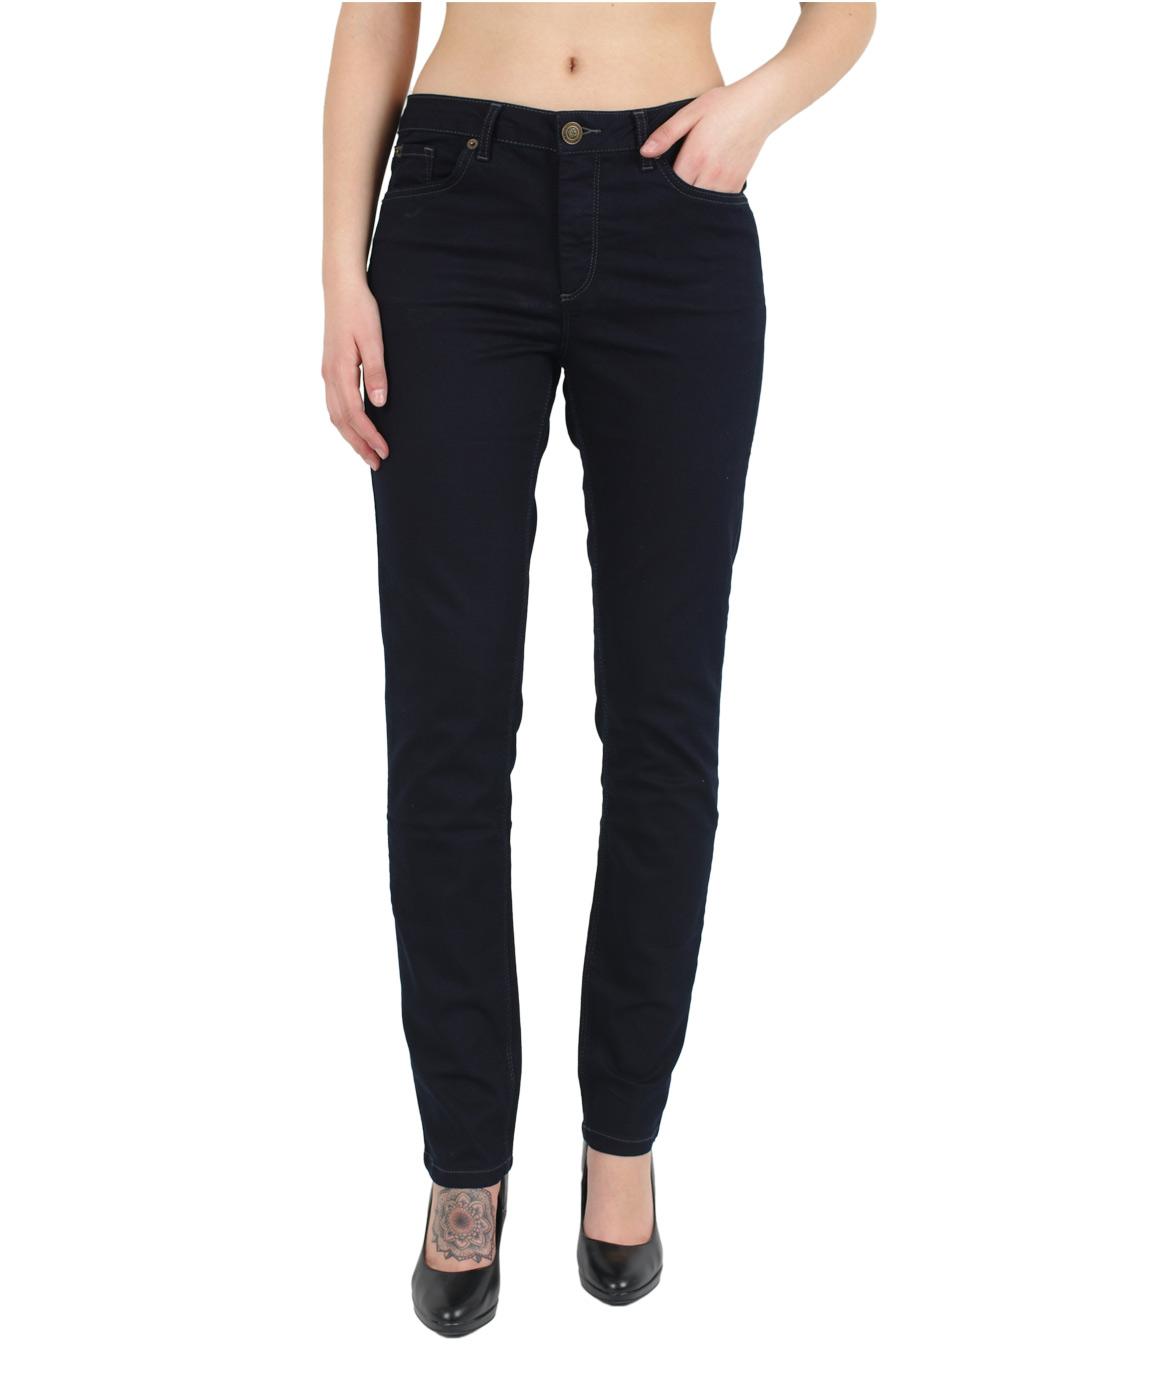 Hosen für Frauen - HIS MARYLIN Jeans Comfort Fit Rich Blue Black  - Onlineshop Jeans Meile